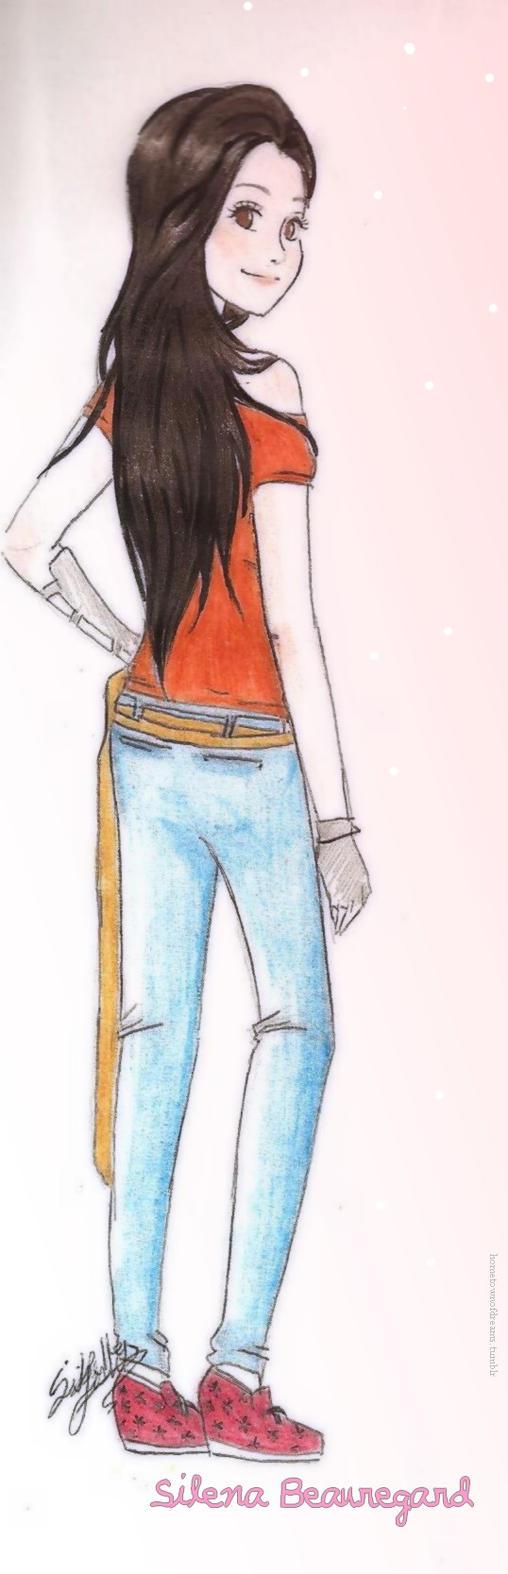 Silena Beauregard by xsweetsillygirl